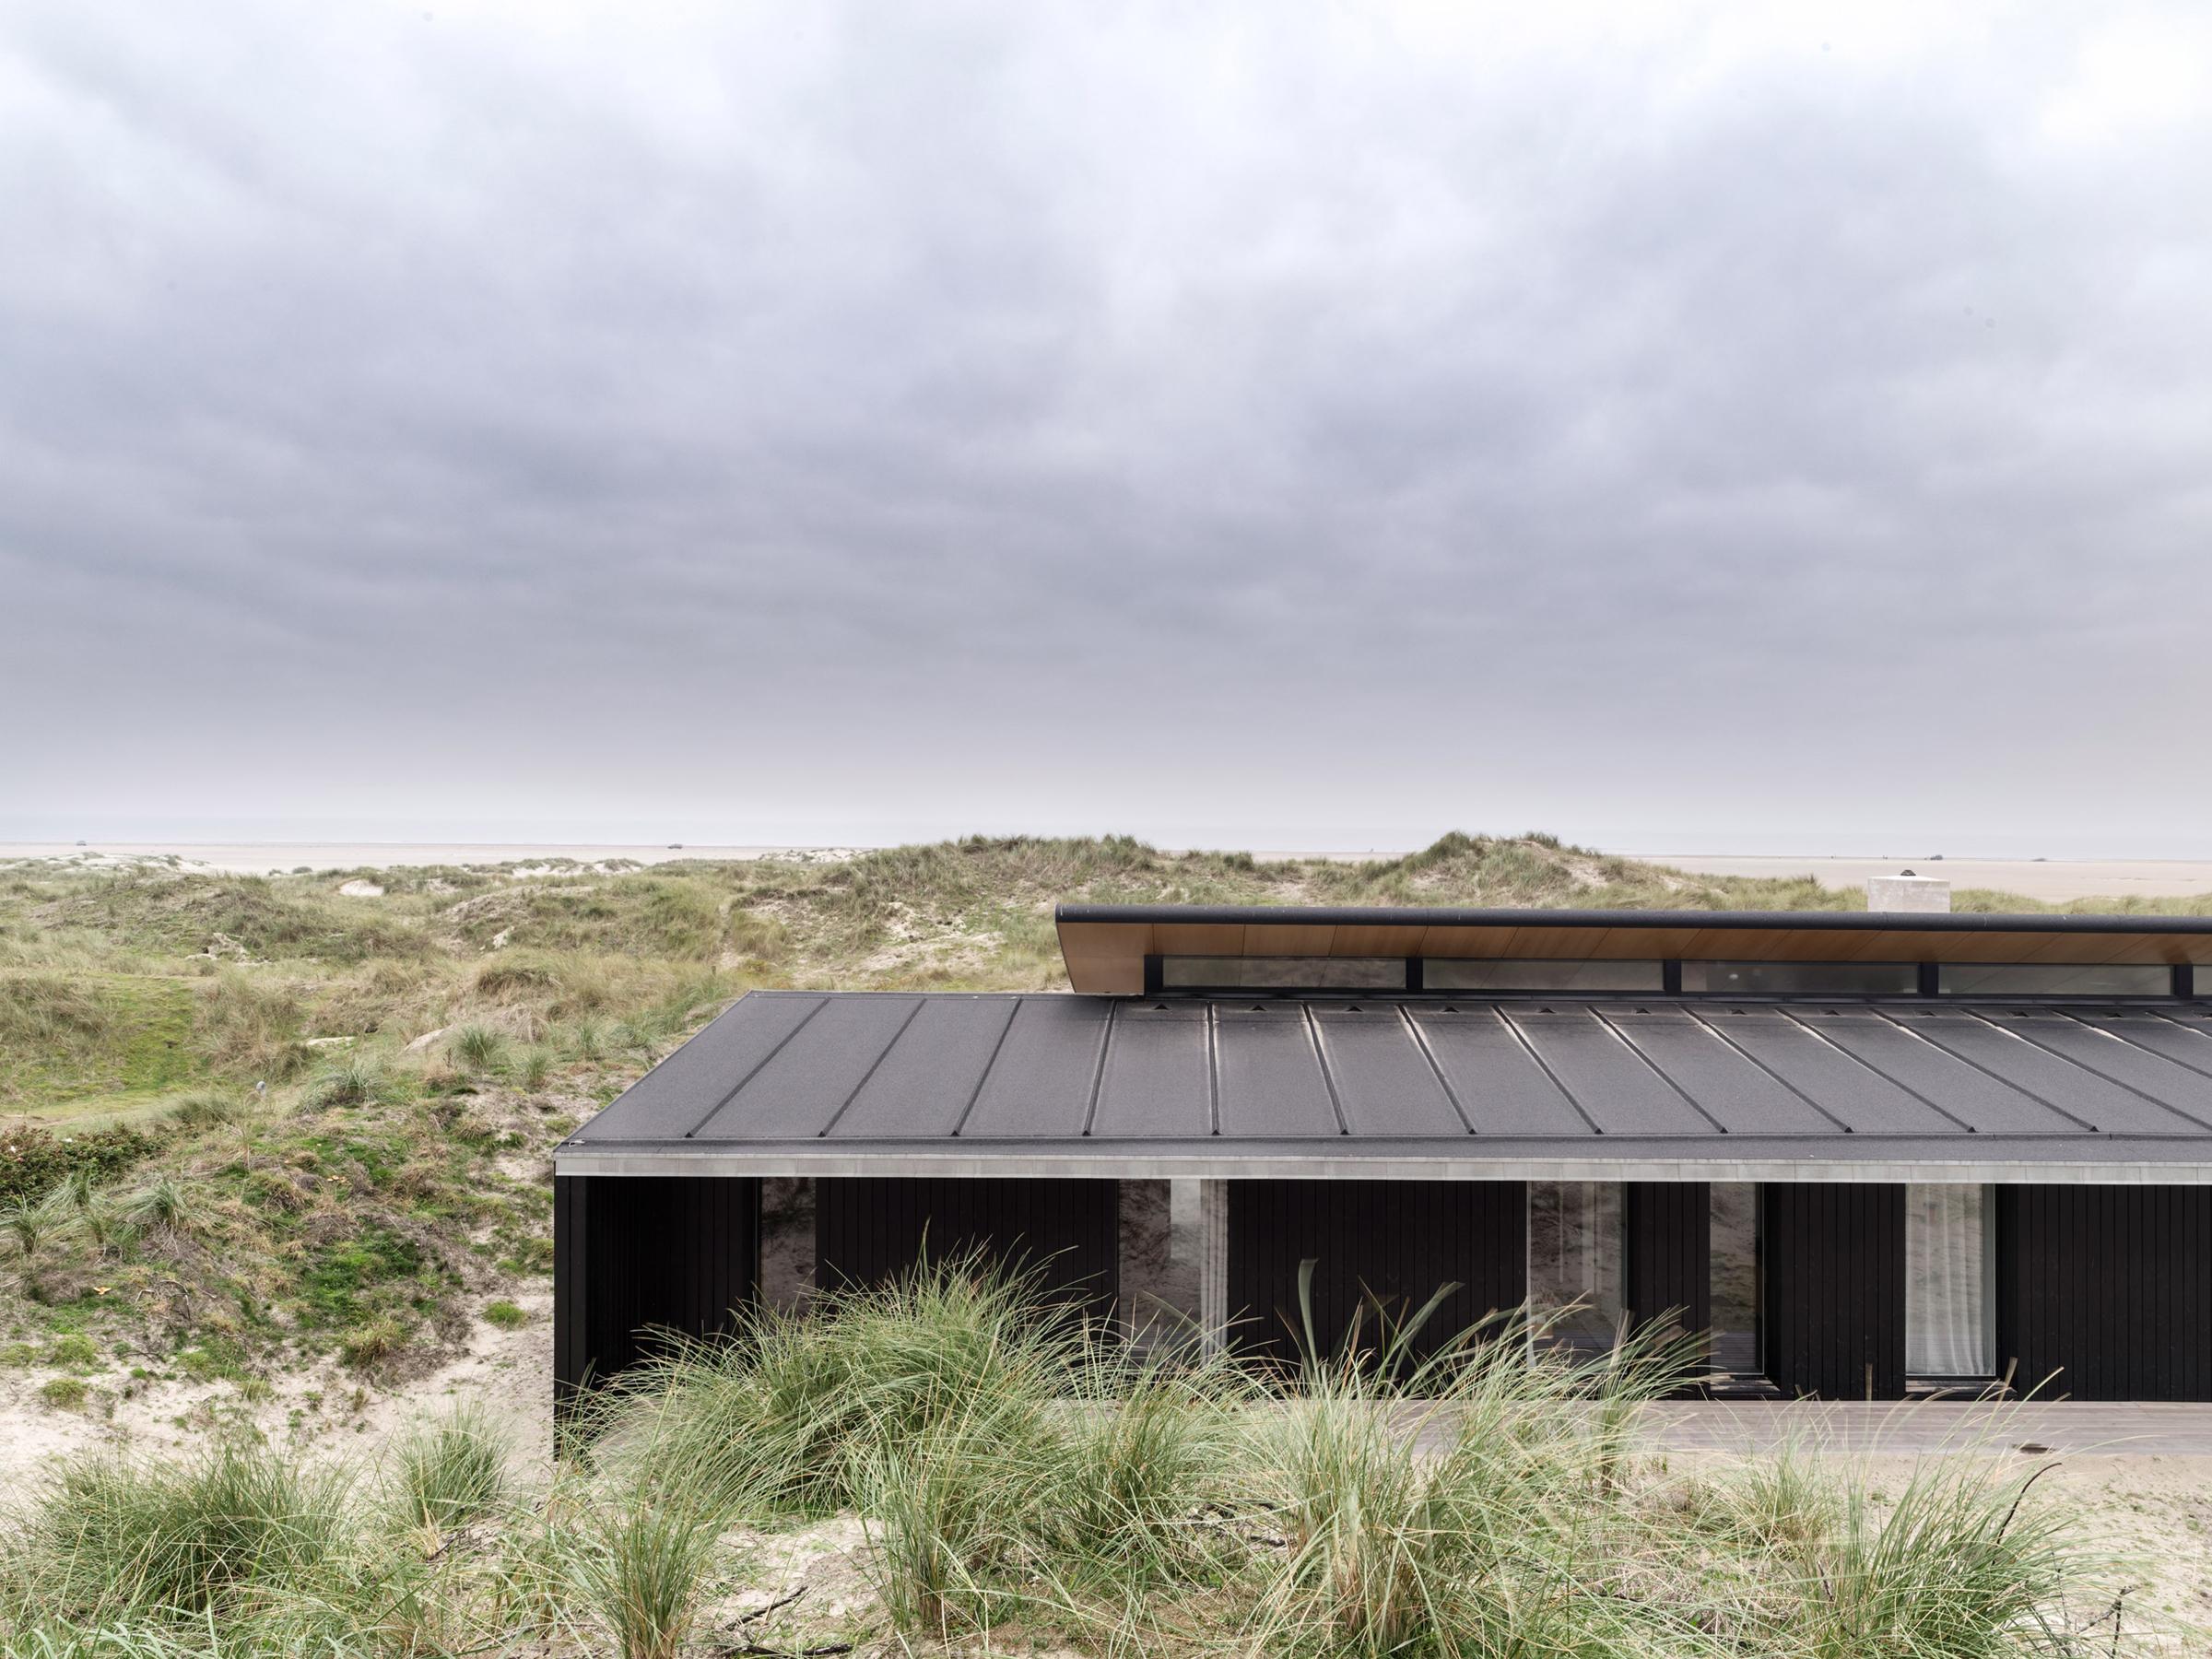 fano-house-knud-holscher-architecture-residential-denmark_dezeen_2364_col_16.jpg